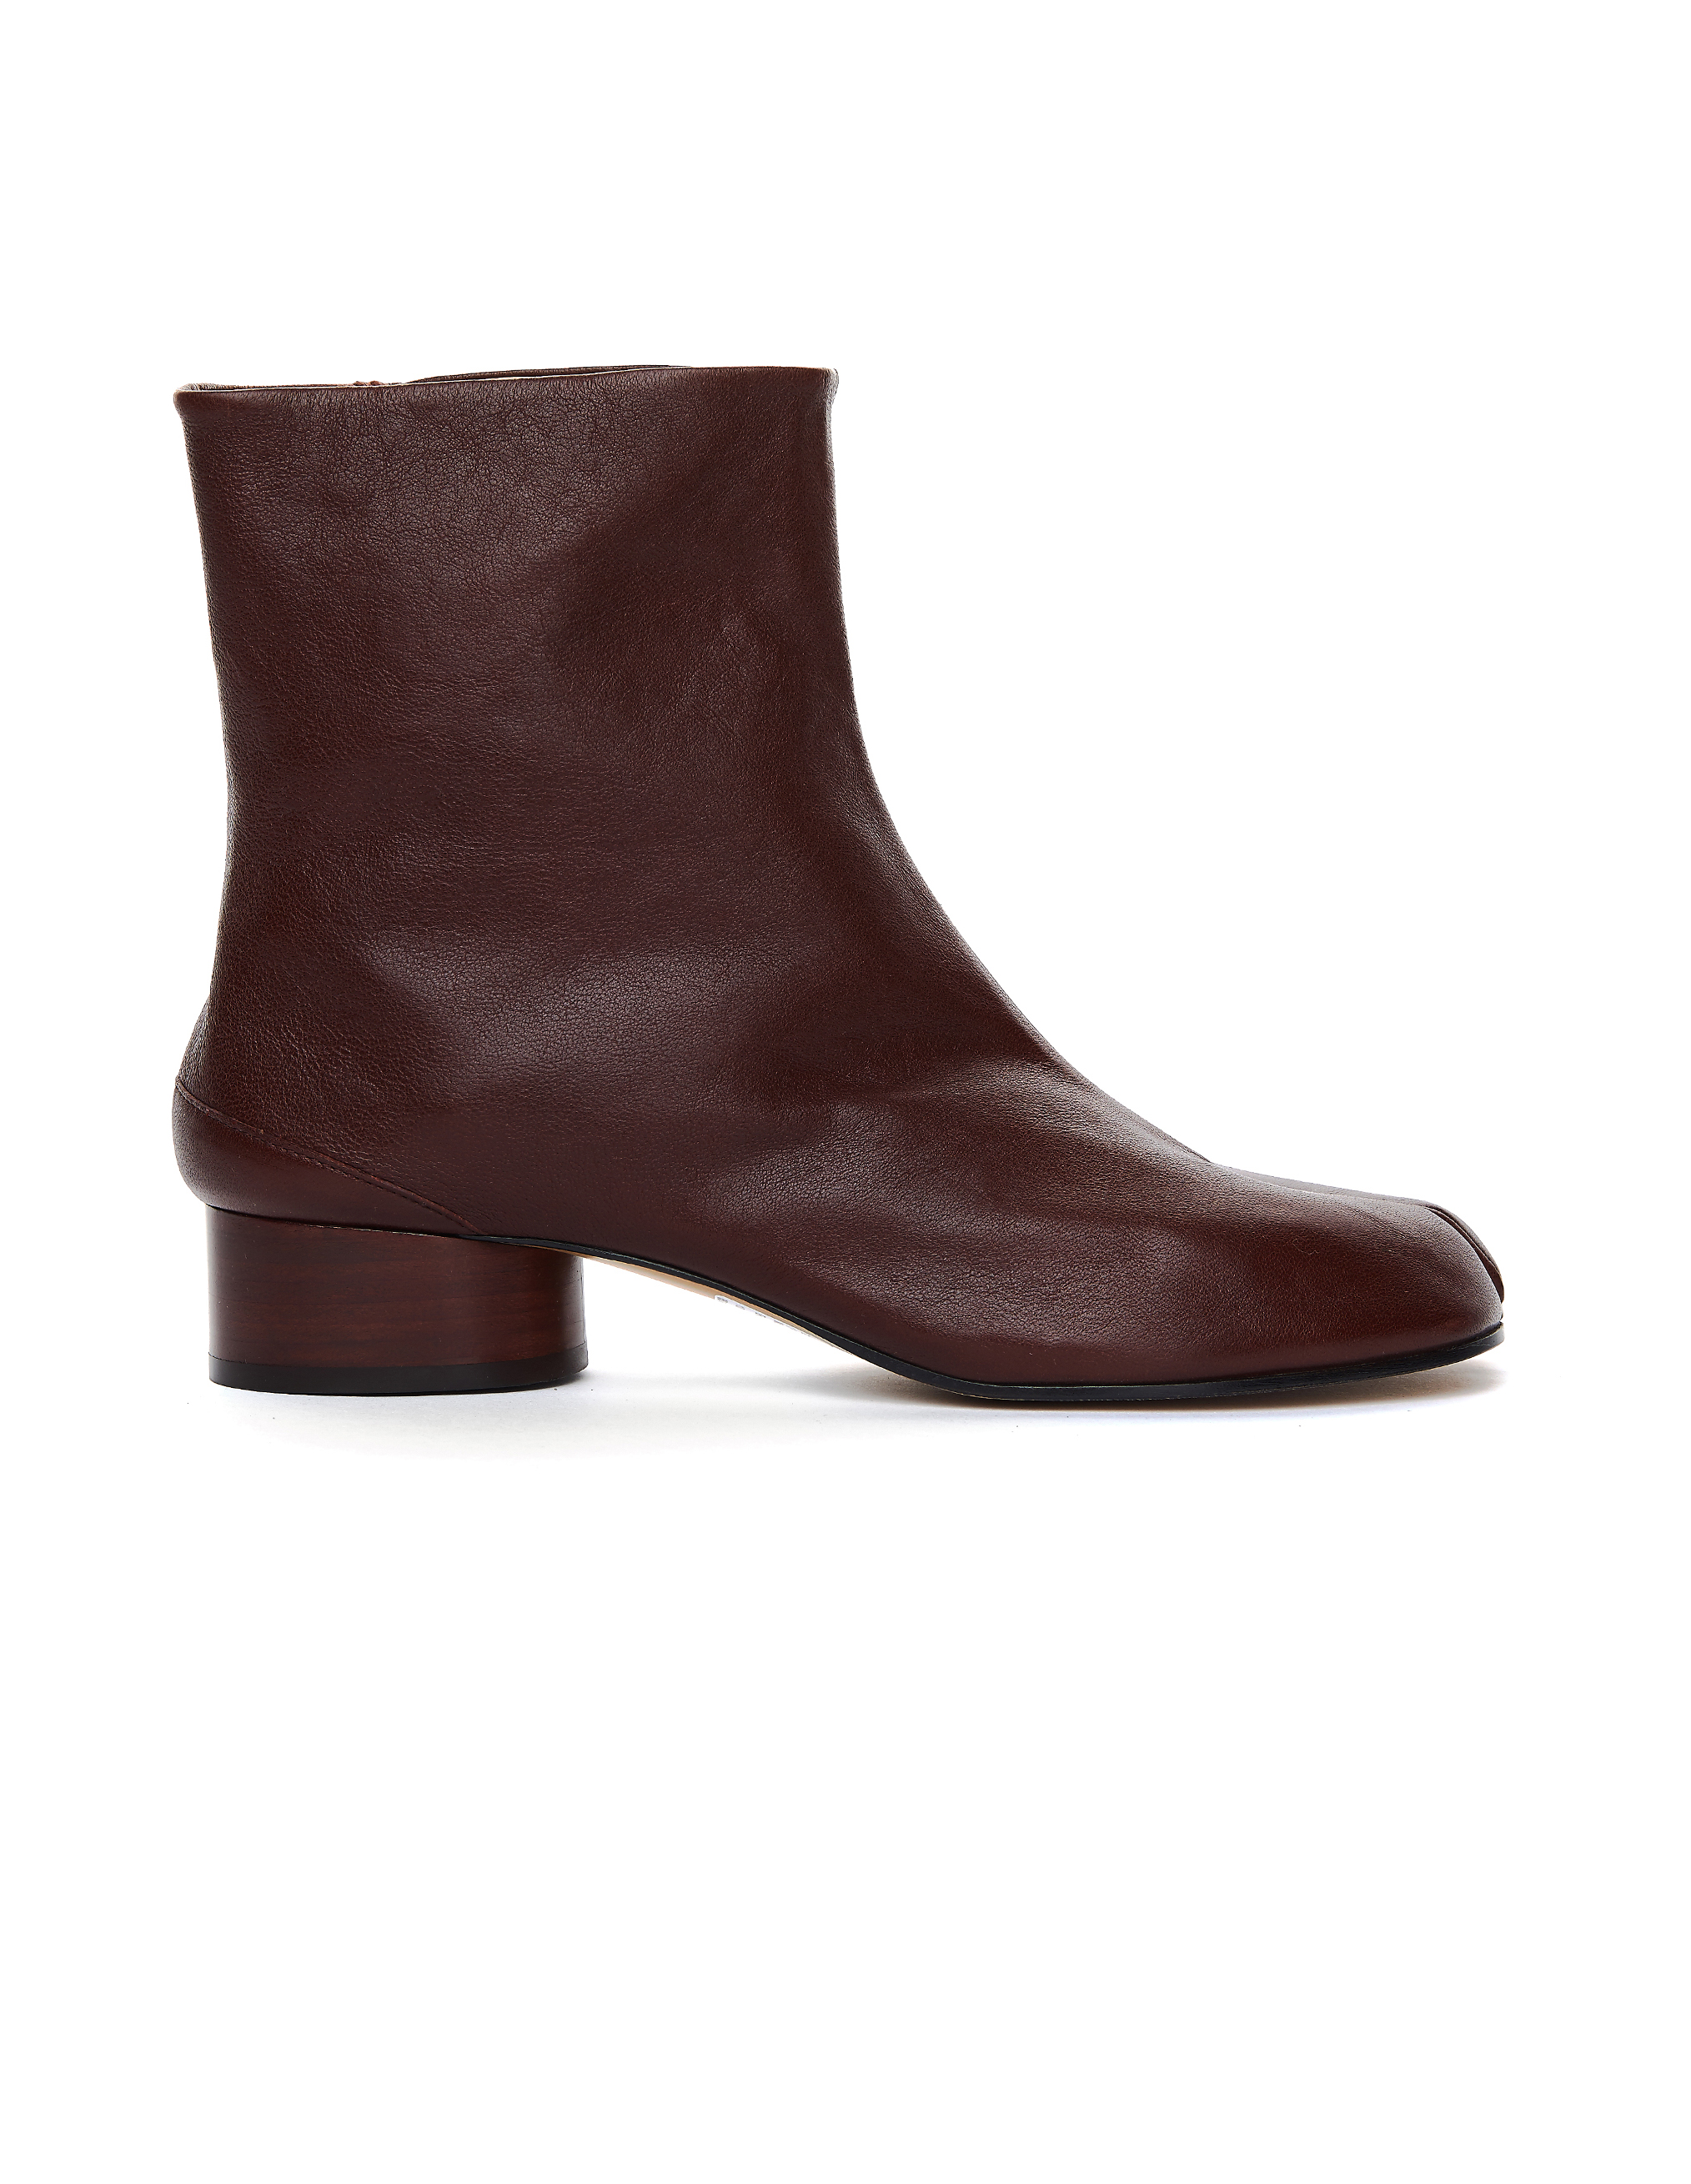 Maison Margiela Burgundy Leather Tabi Boots